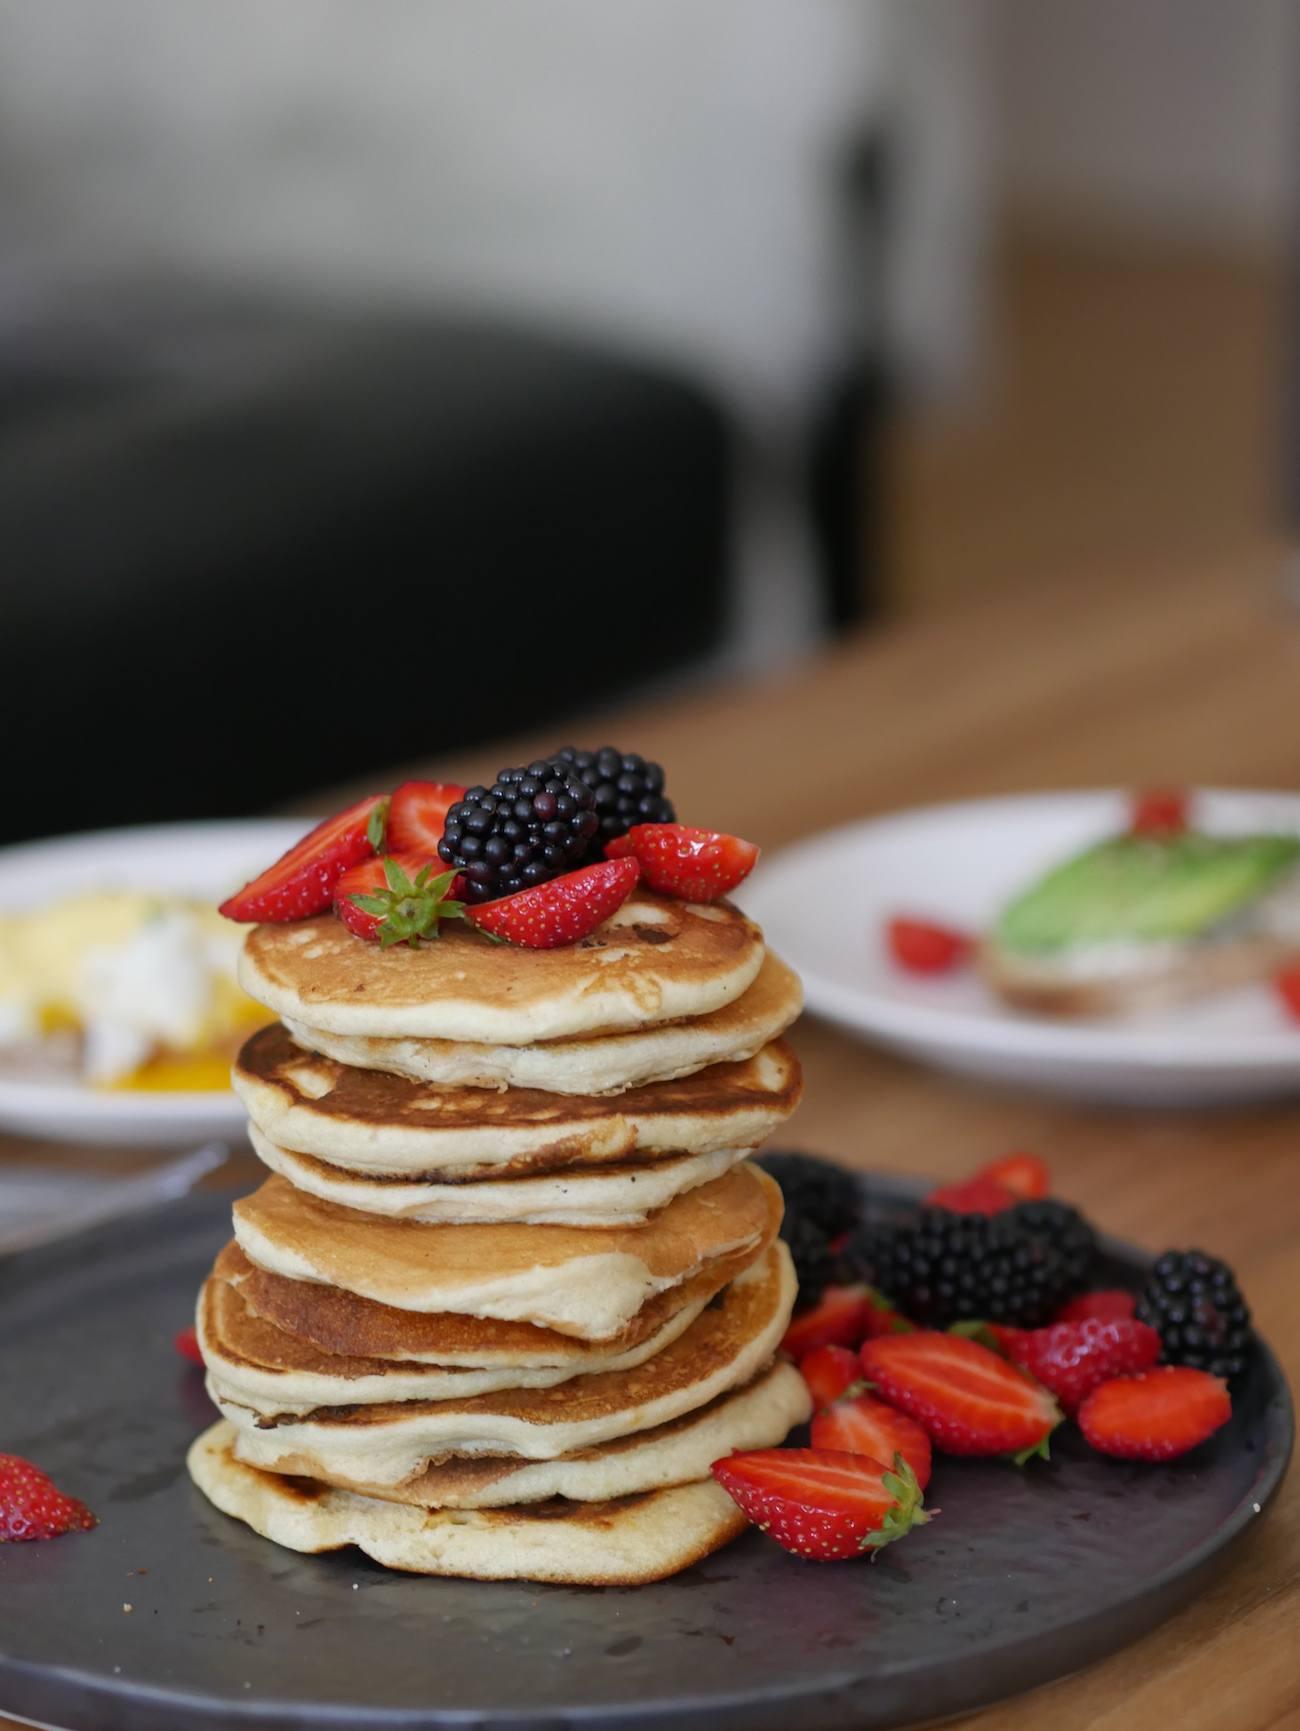 brunch-maison-recette-pancakes-toast-oeuf-benedicte-infuz-3